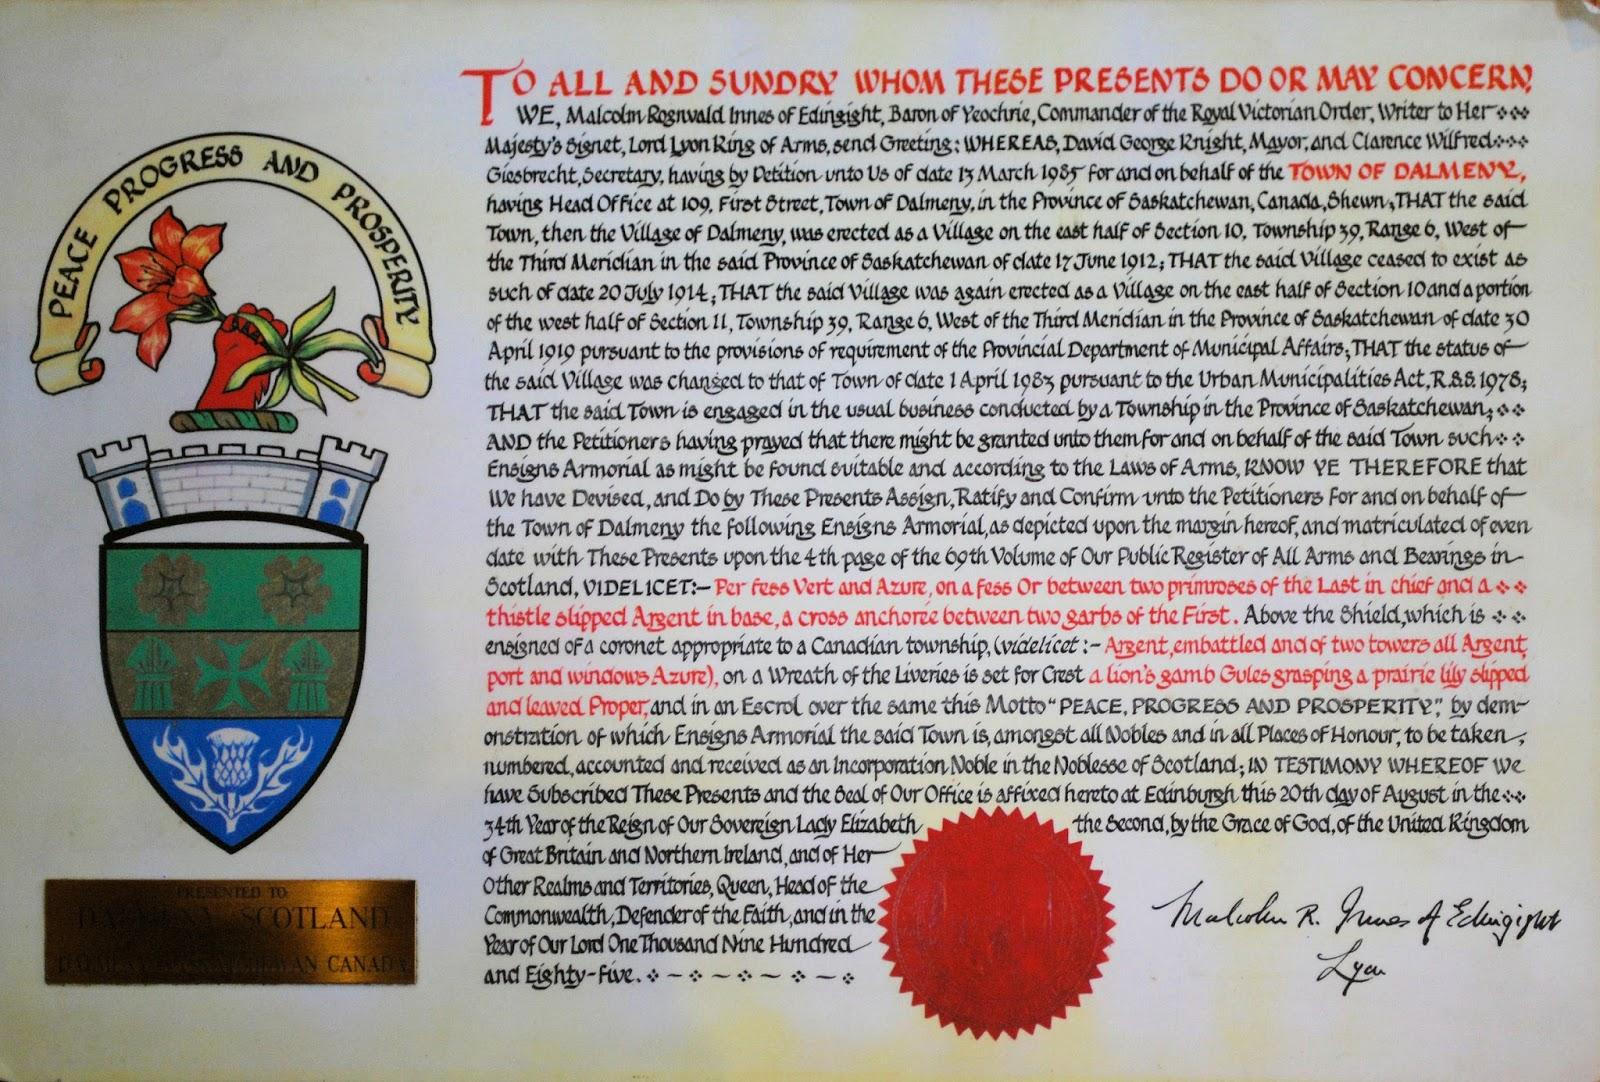 Heraldry: An Heraldic Stray in Scotland?